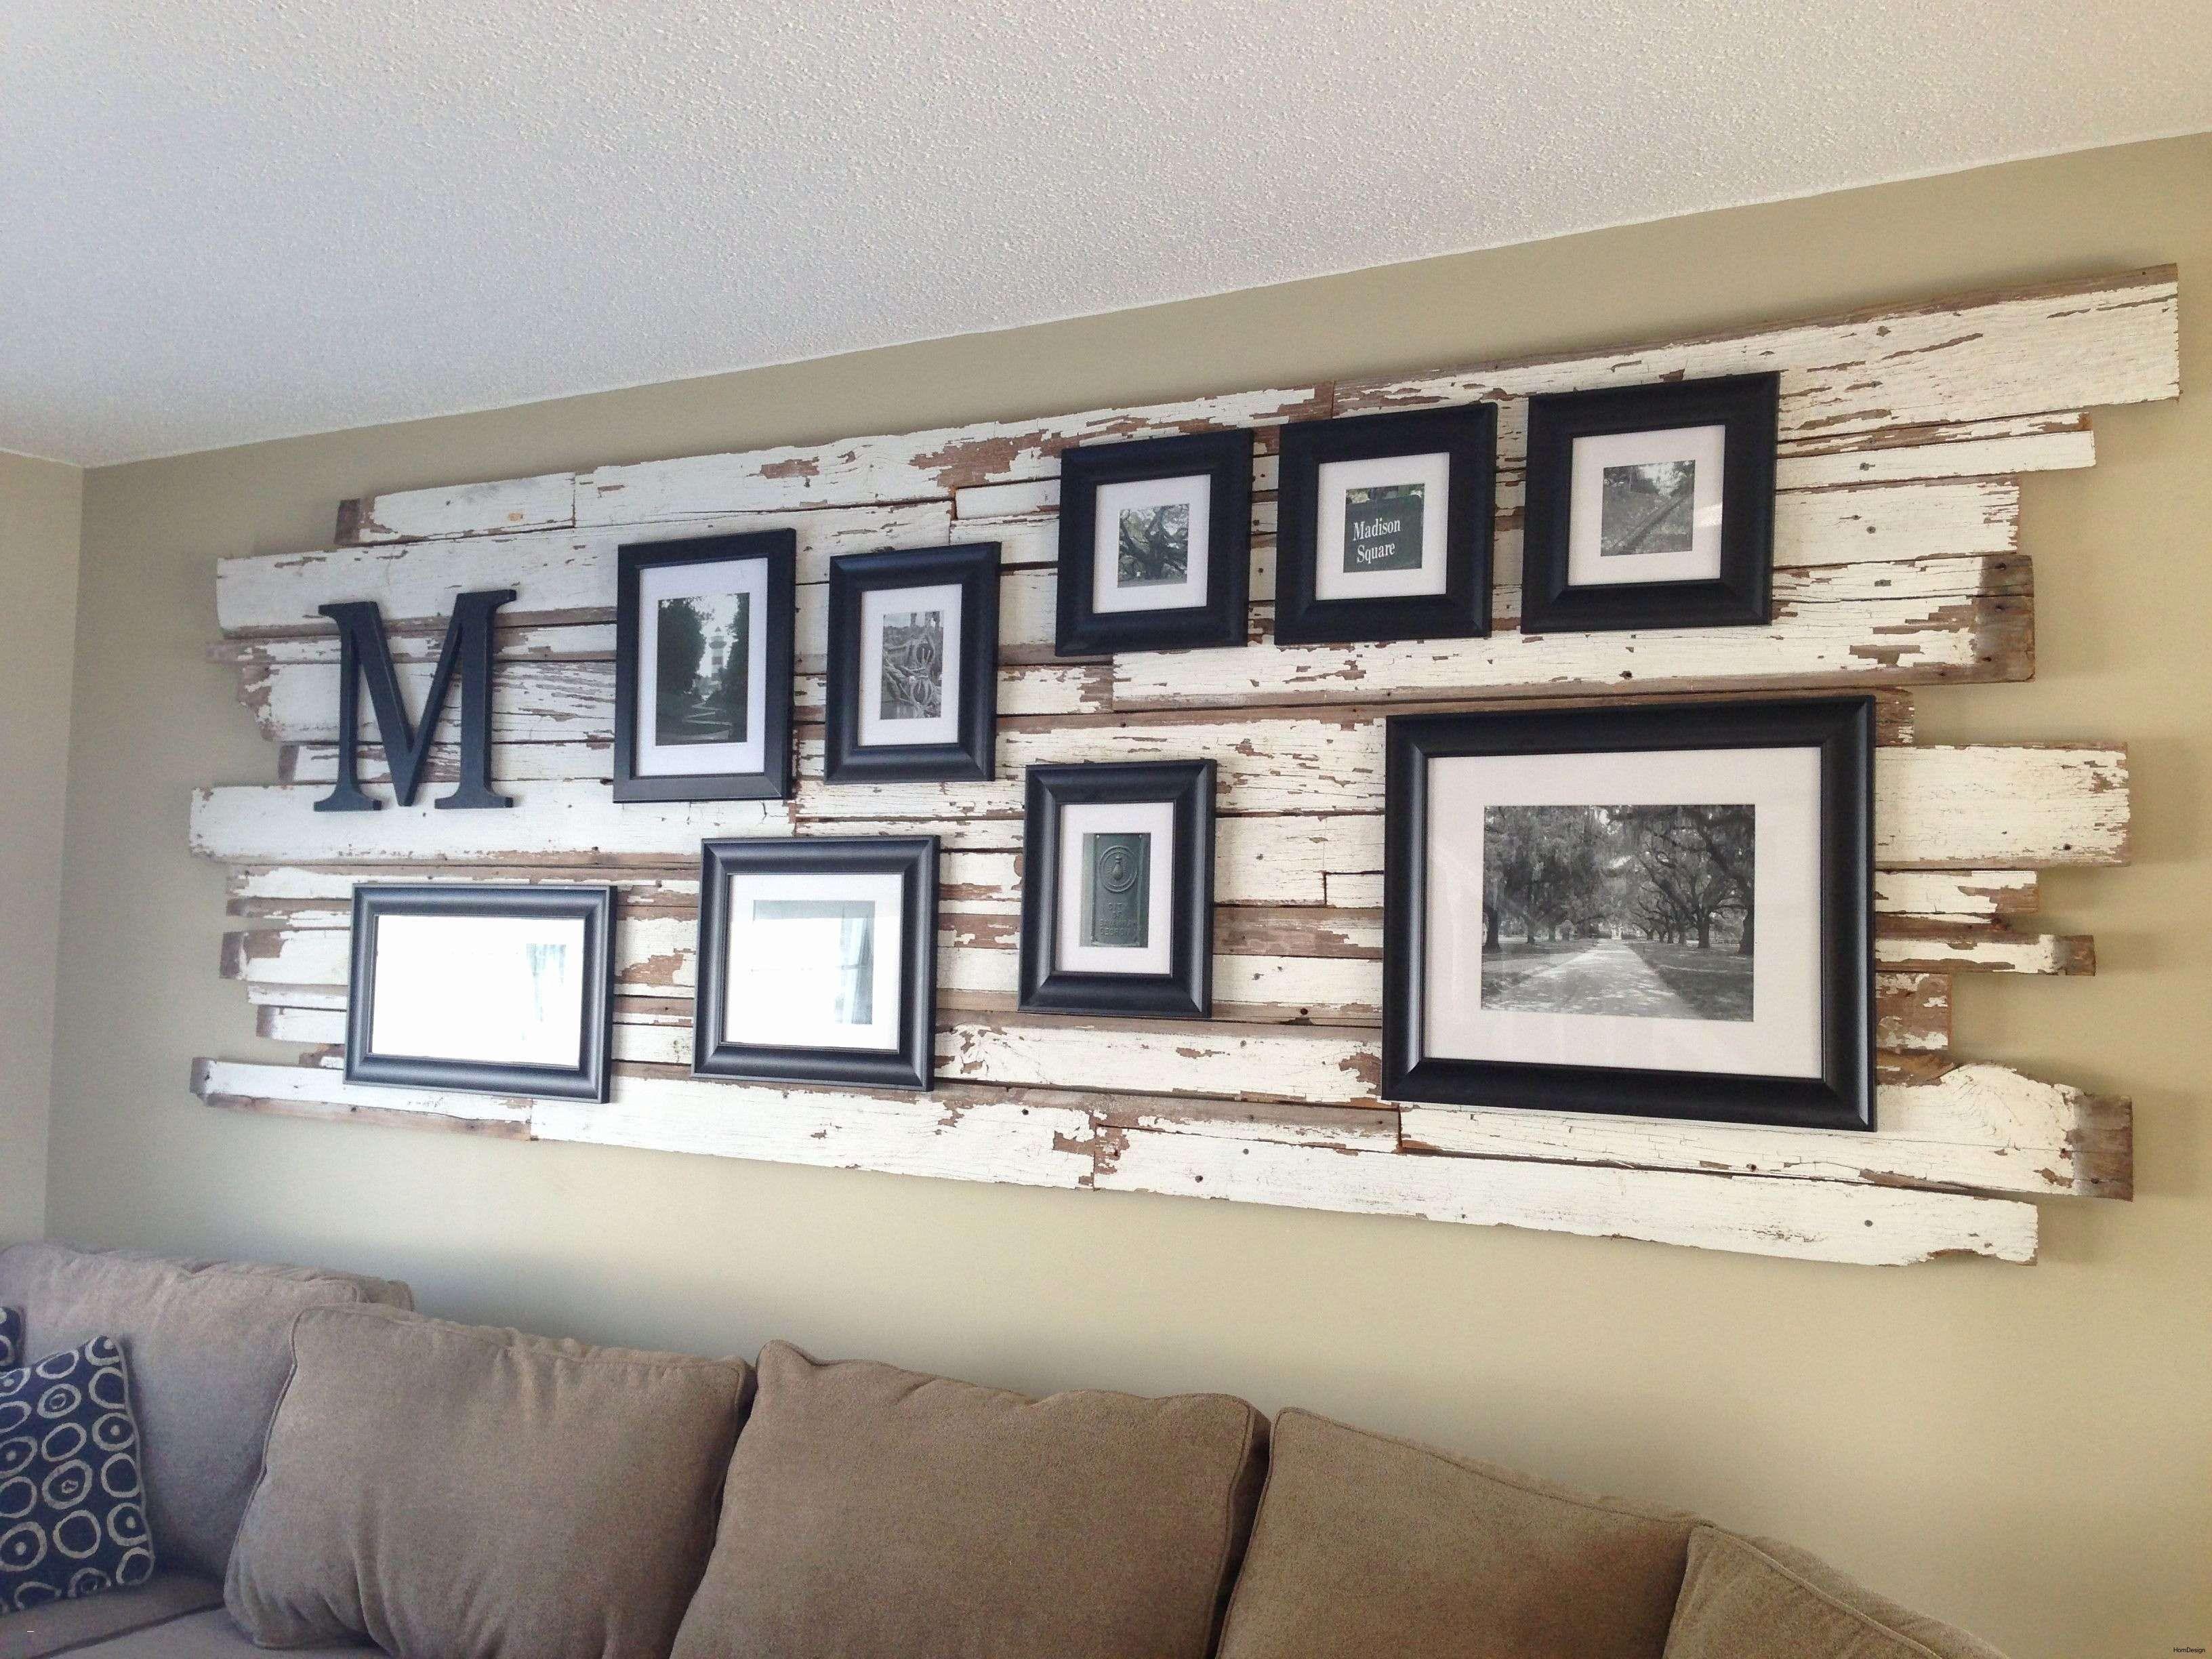 30 Inexpensive Kitchen Wall Decorating Ideas Hallway Wall Decor